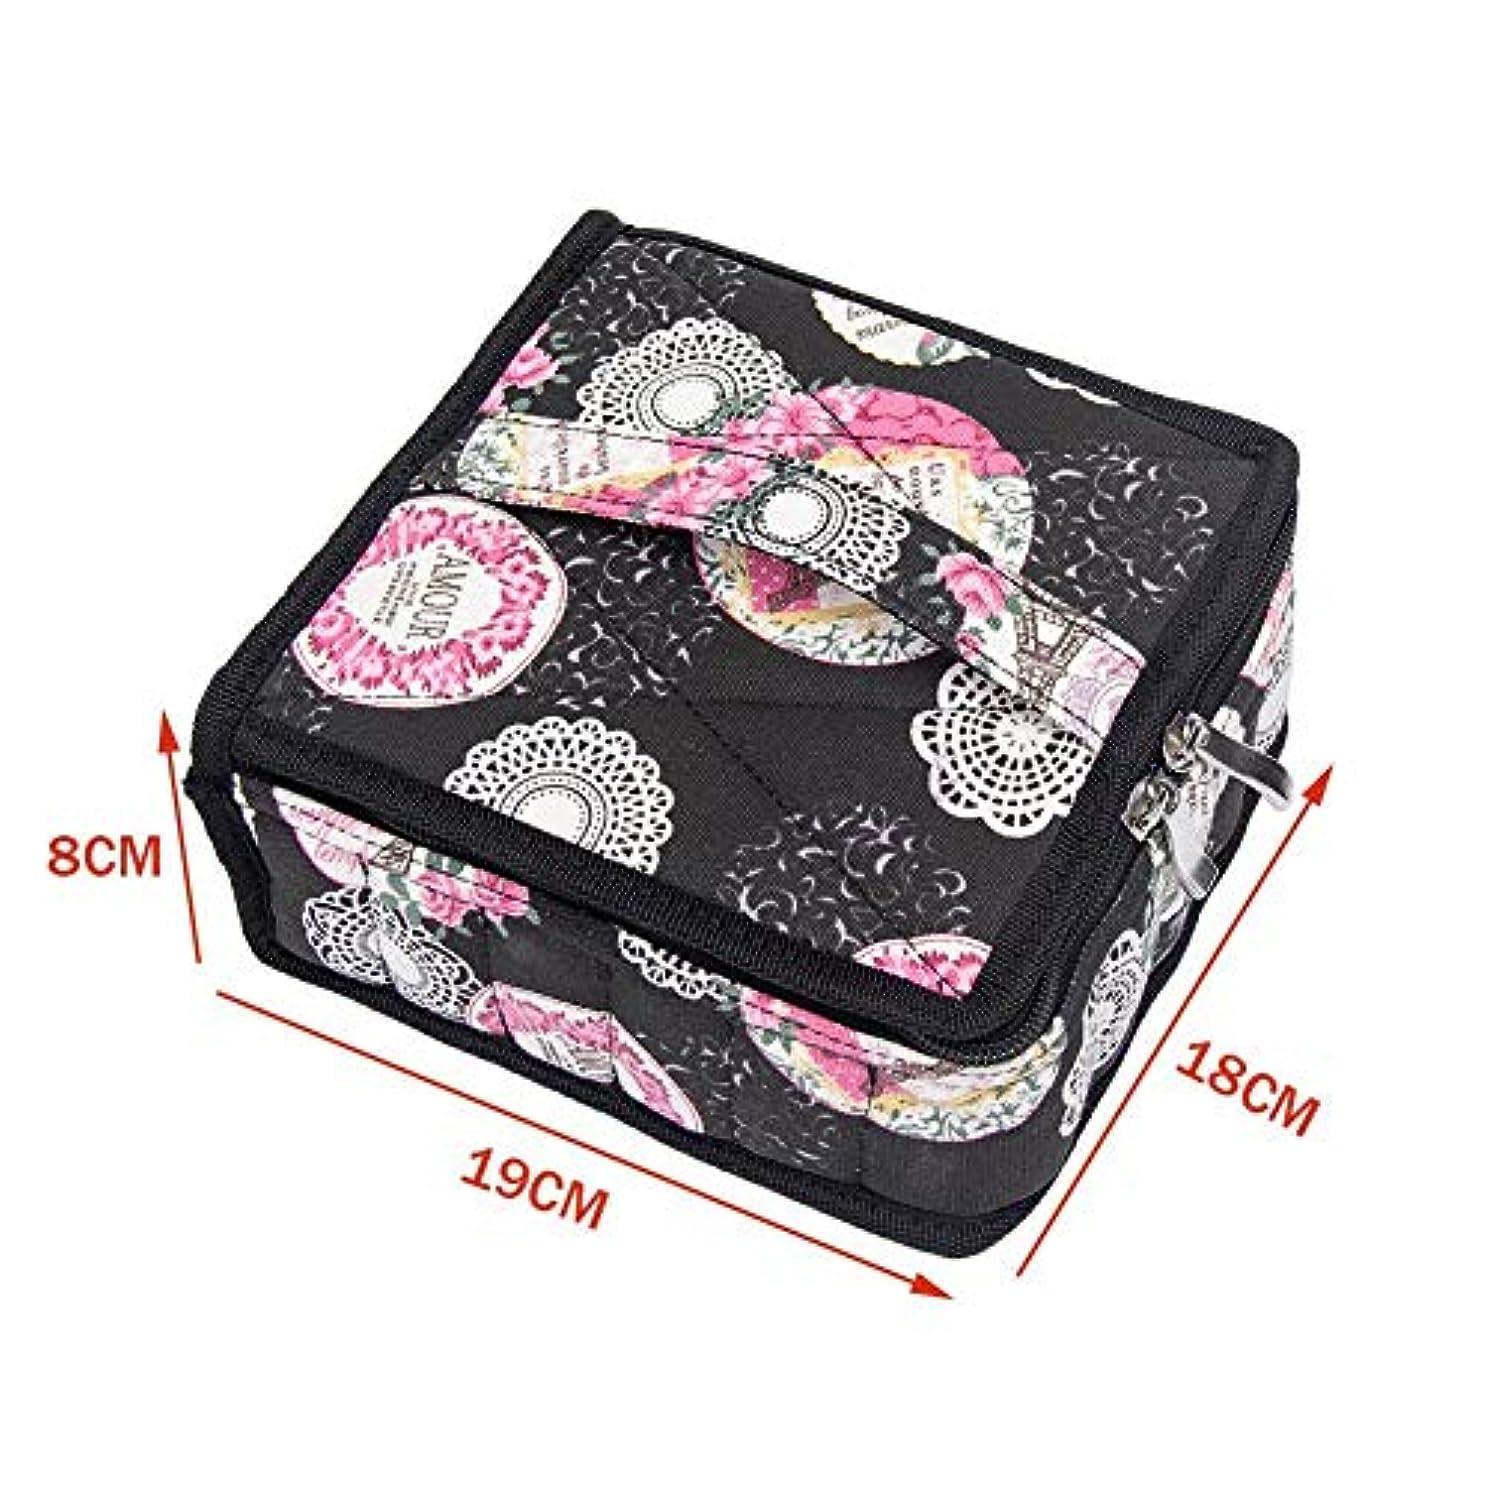 Pursue エッセンシャルオイル収納ケース アロマオイル収納ボックス アロマポーチ収納ケース 耐震 携帯便利 香水収納ポーチ 化粧ポーチ30本用